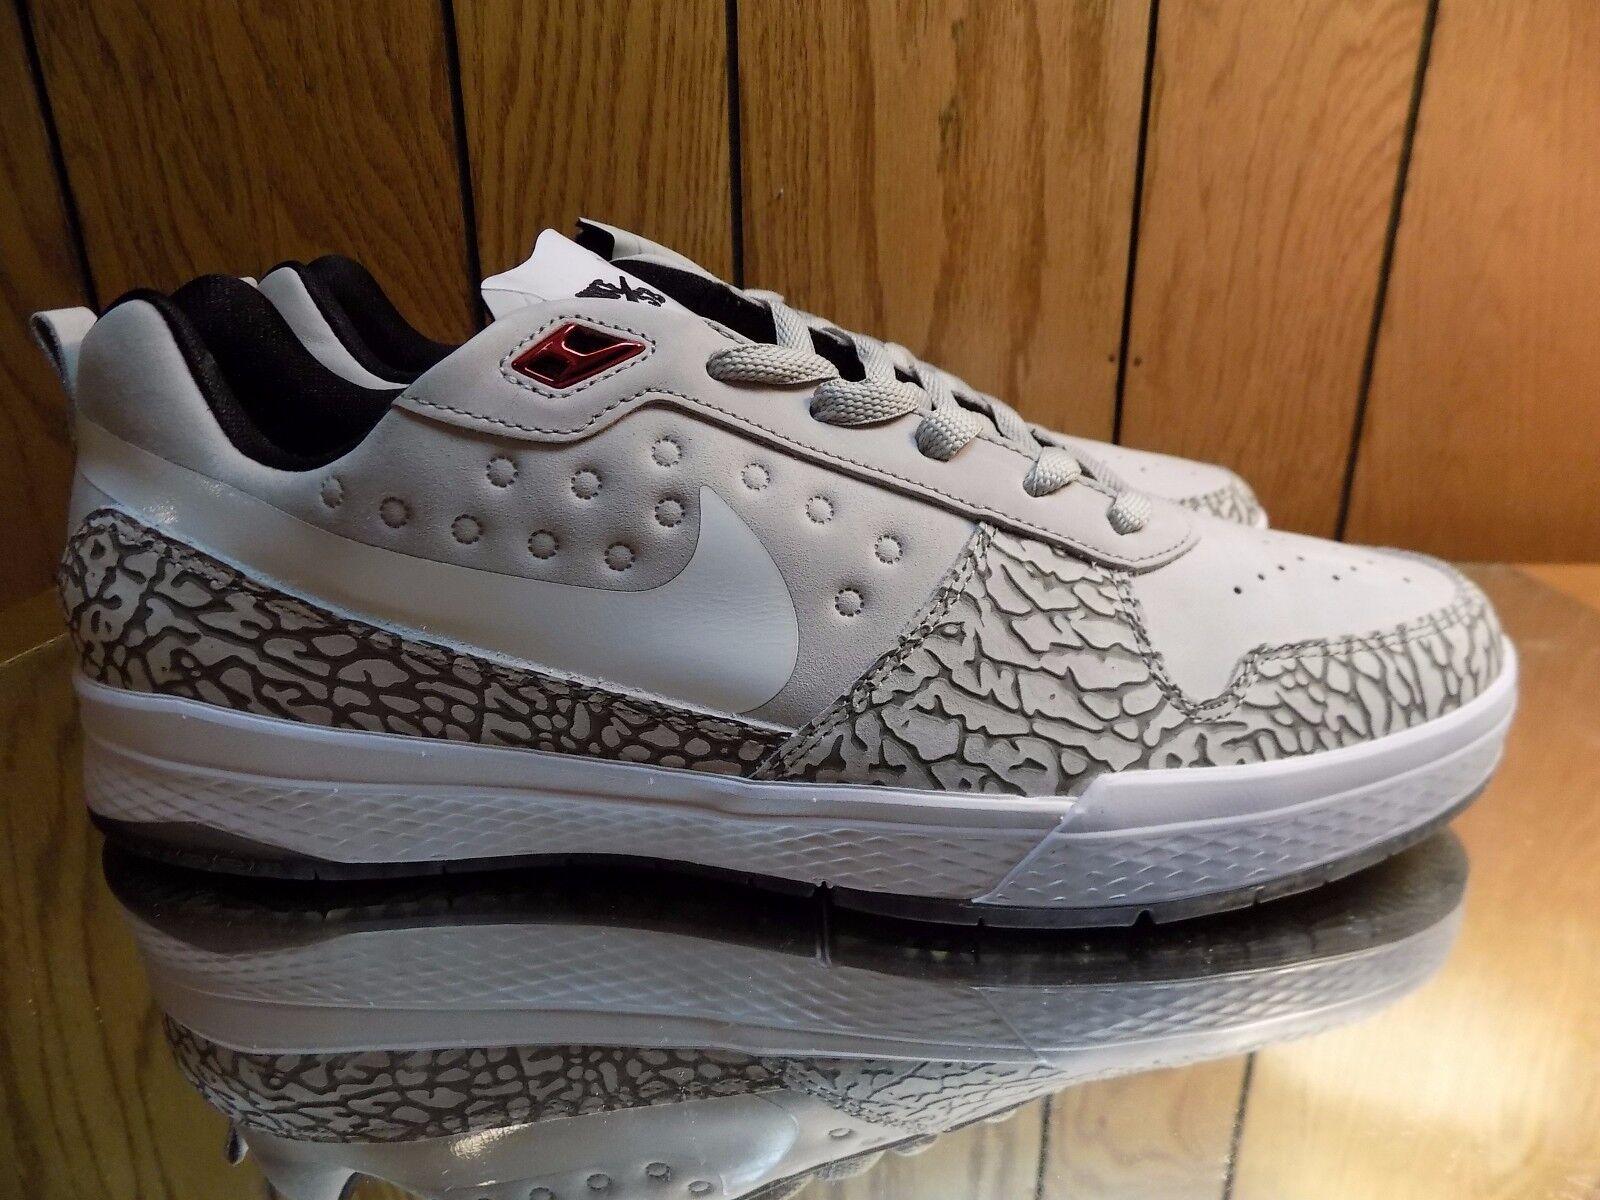 Nike uomini zoom hypershift tbc promo scarpe scarpe scarpe da basket sz.17 nuovi 856488-661 973234